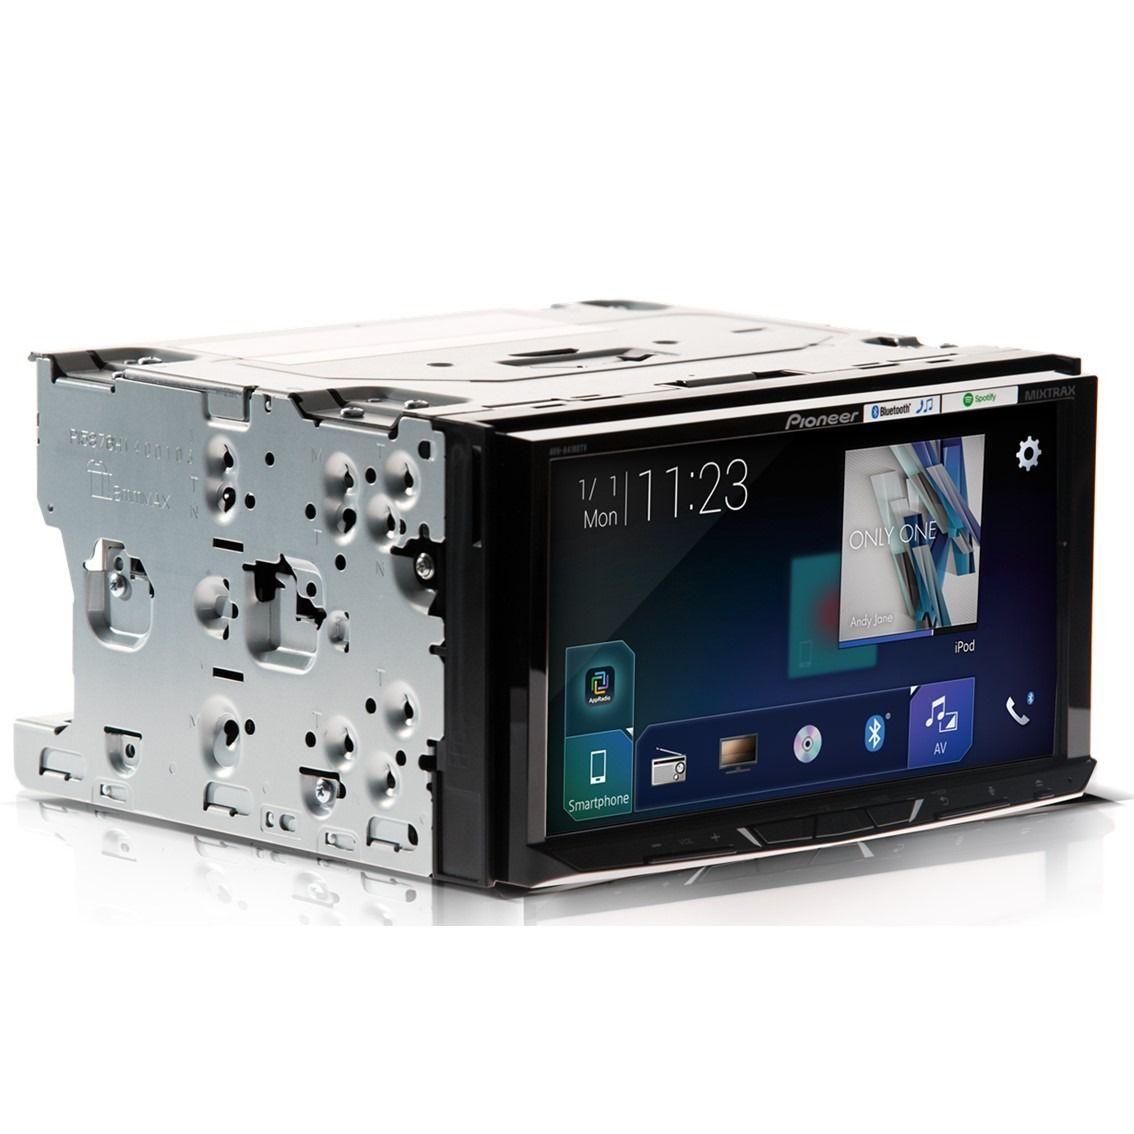 "Central Multimdia DVD Player Automotivo 2 DIN Pioneer AVH-A4180TV Tela 7"" - Bluetooth Com Entrada USB - TV DIGITAL"